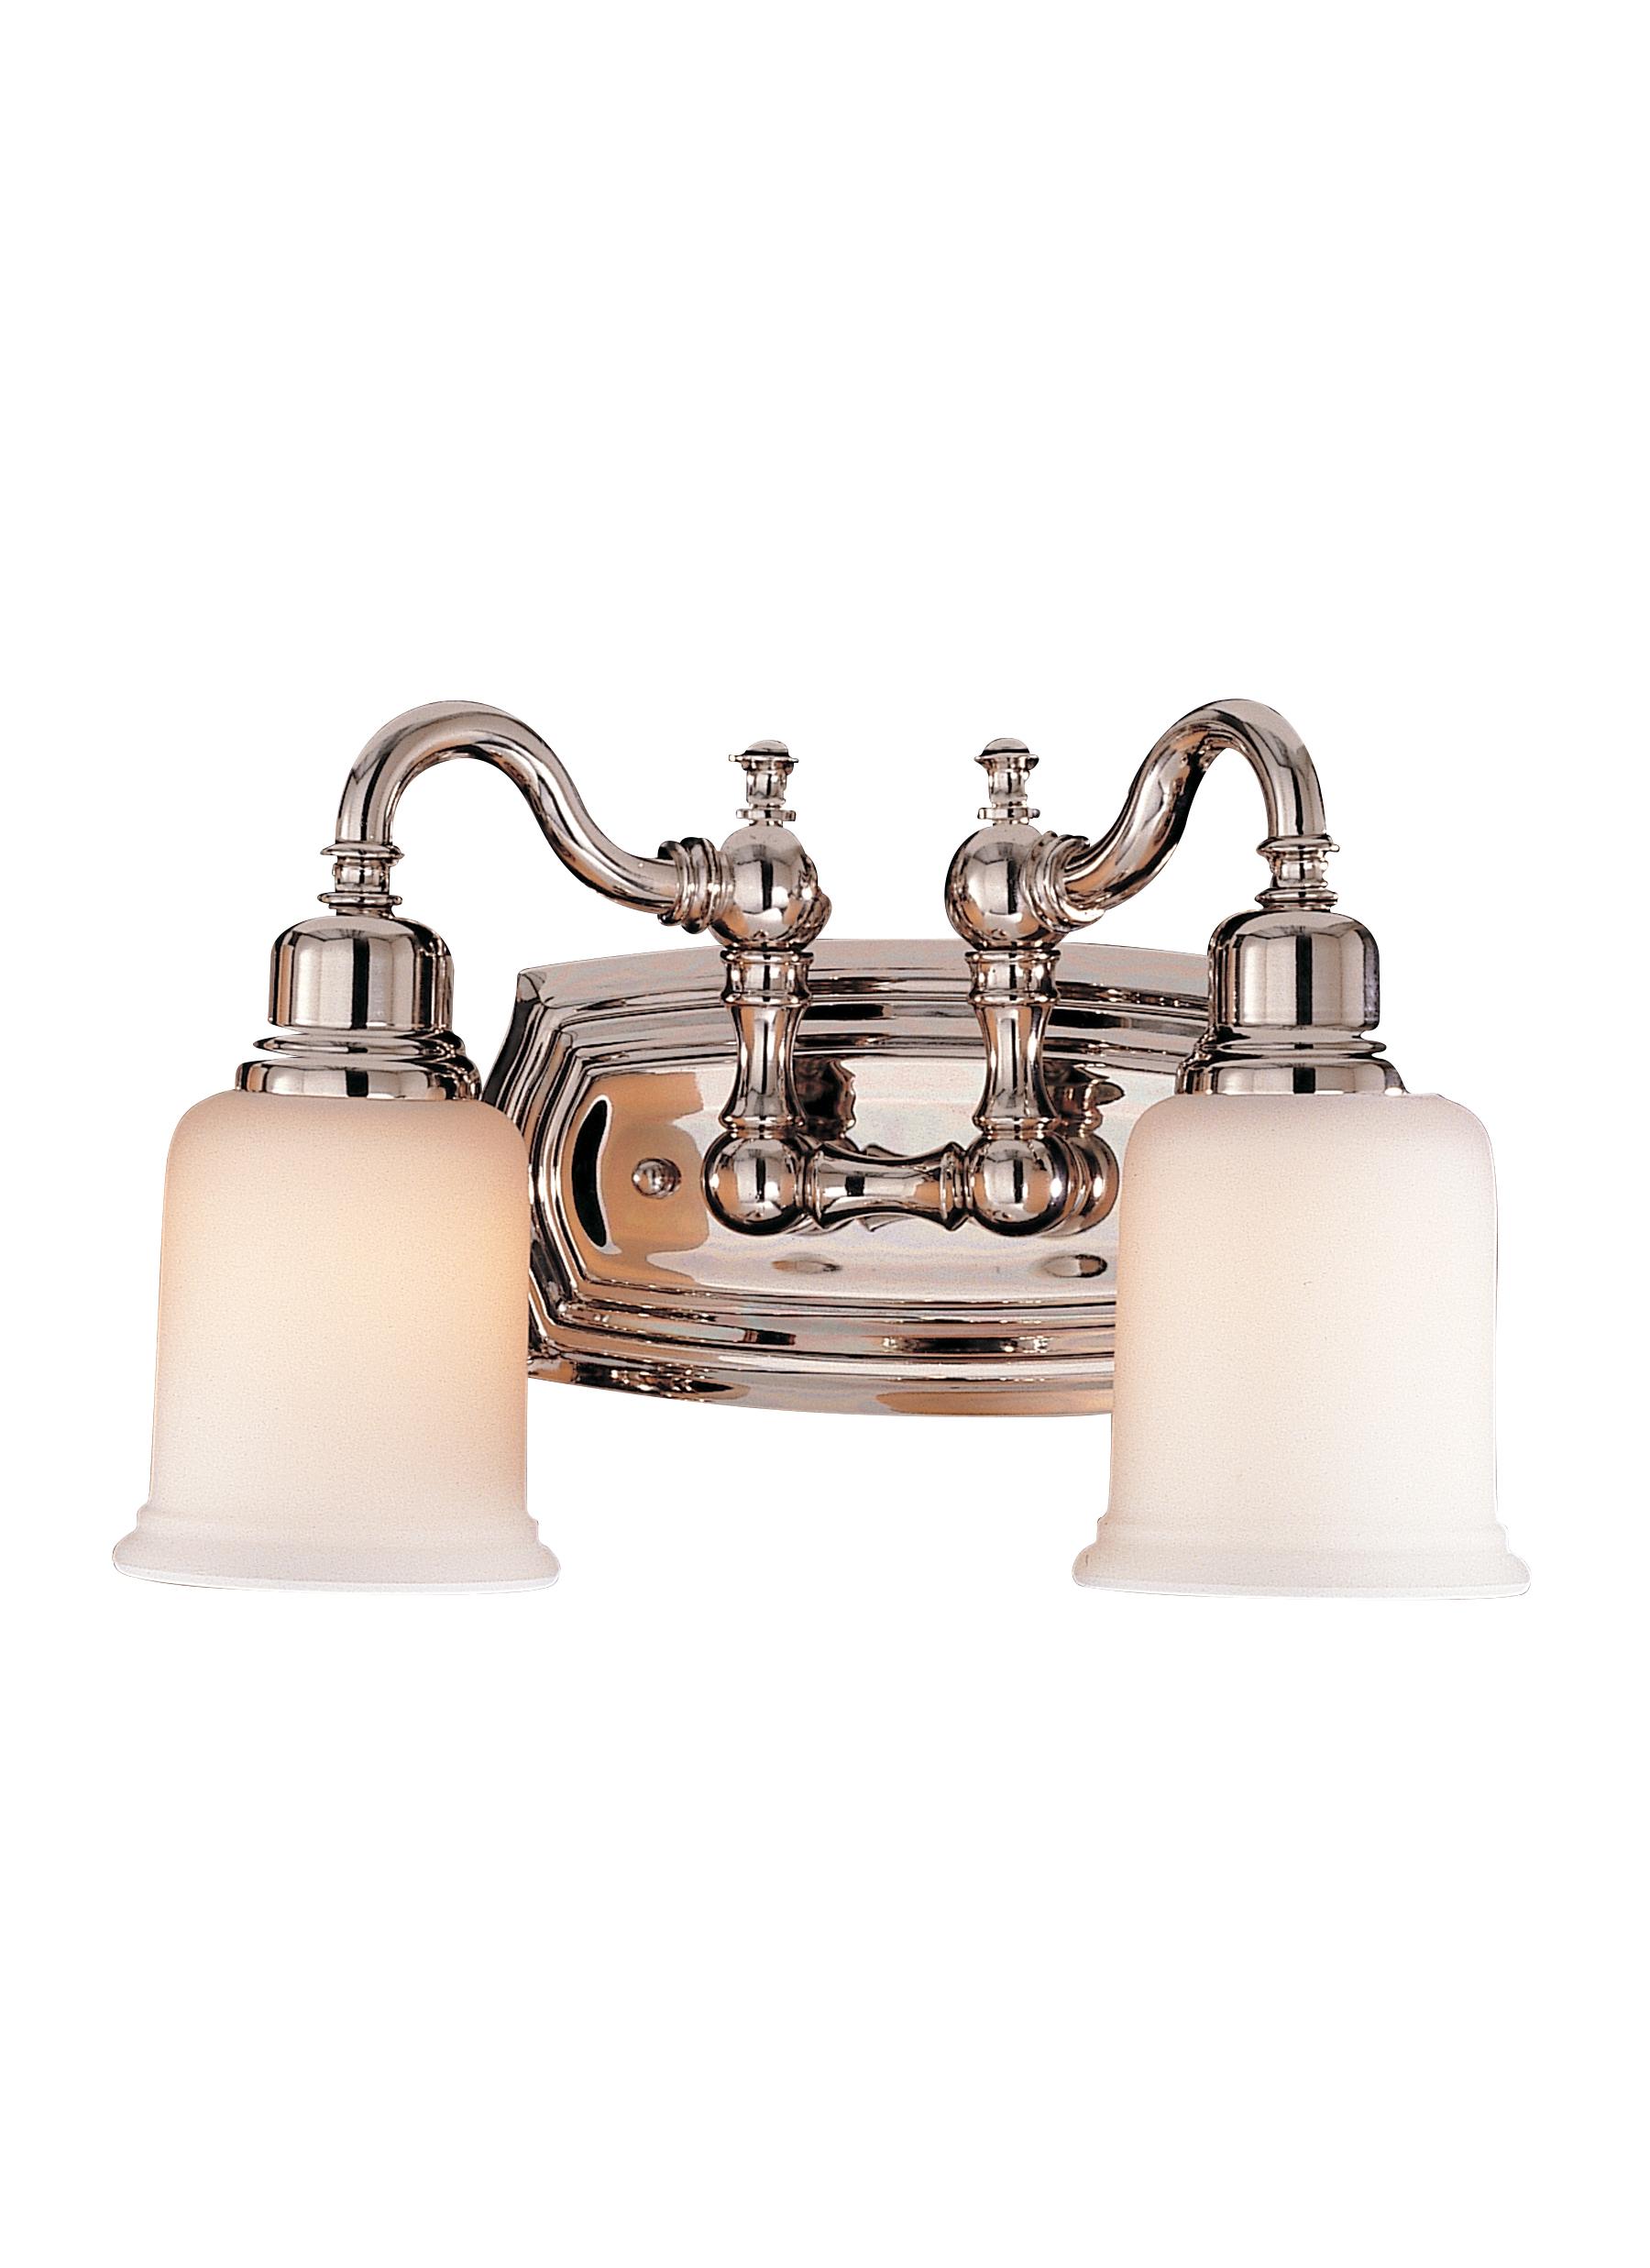 Bathroom Light Fixtures Polished Nickel vs8002-pn,2 - light vanity fixture,polished nickel